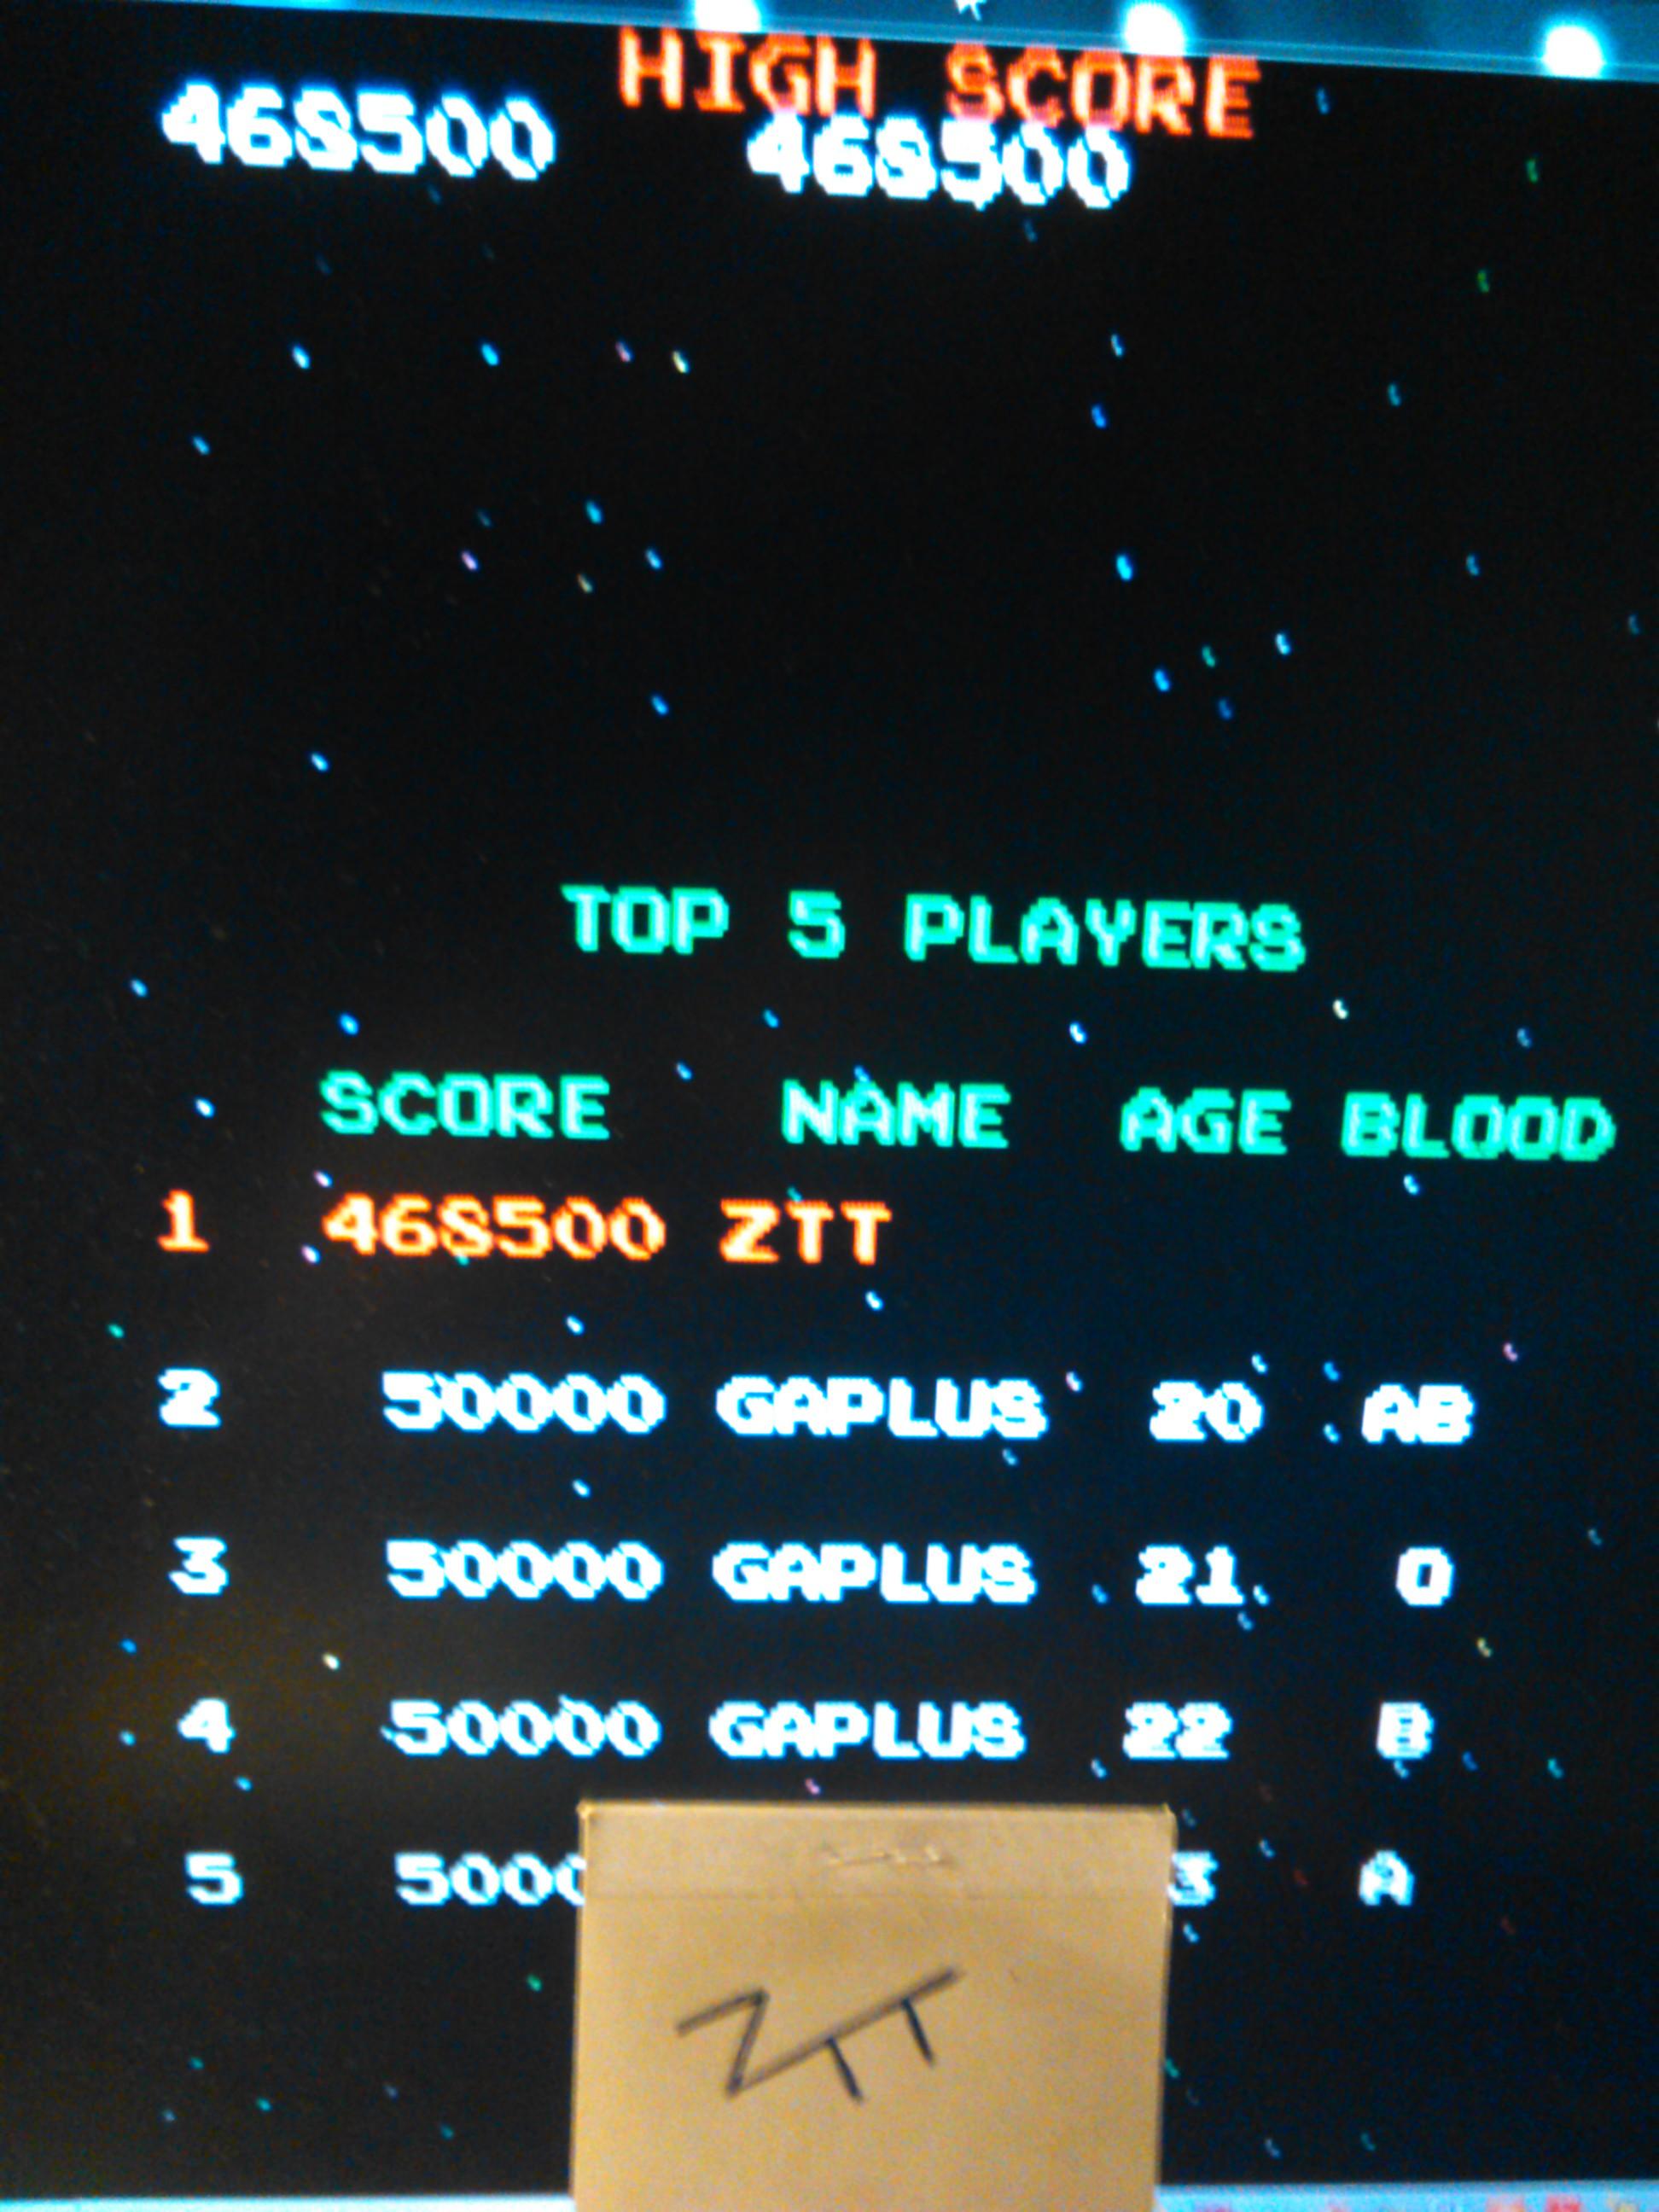 Gaplus 468,500 points